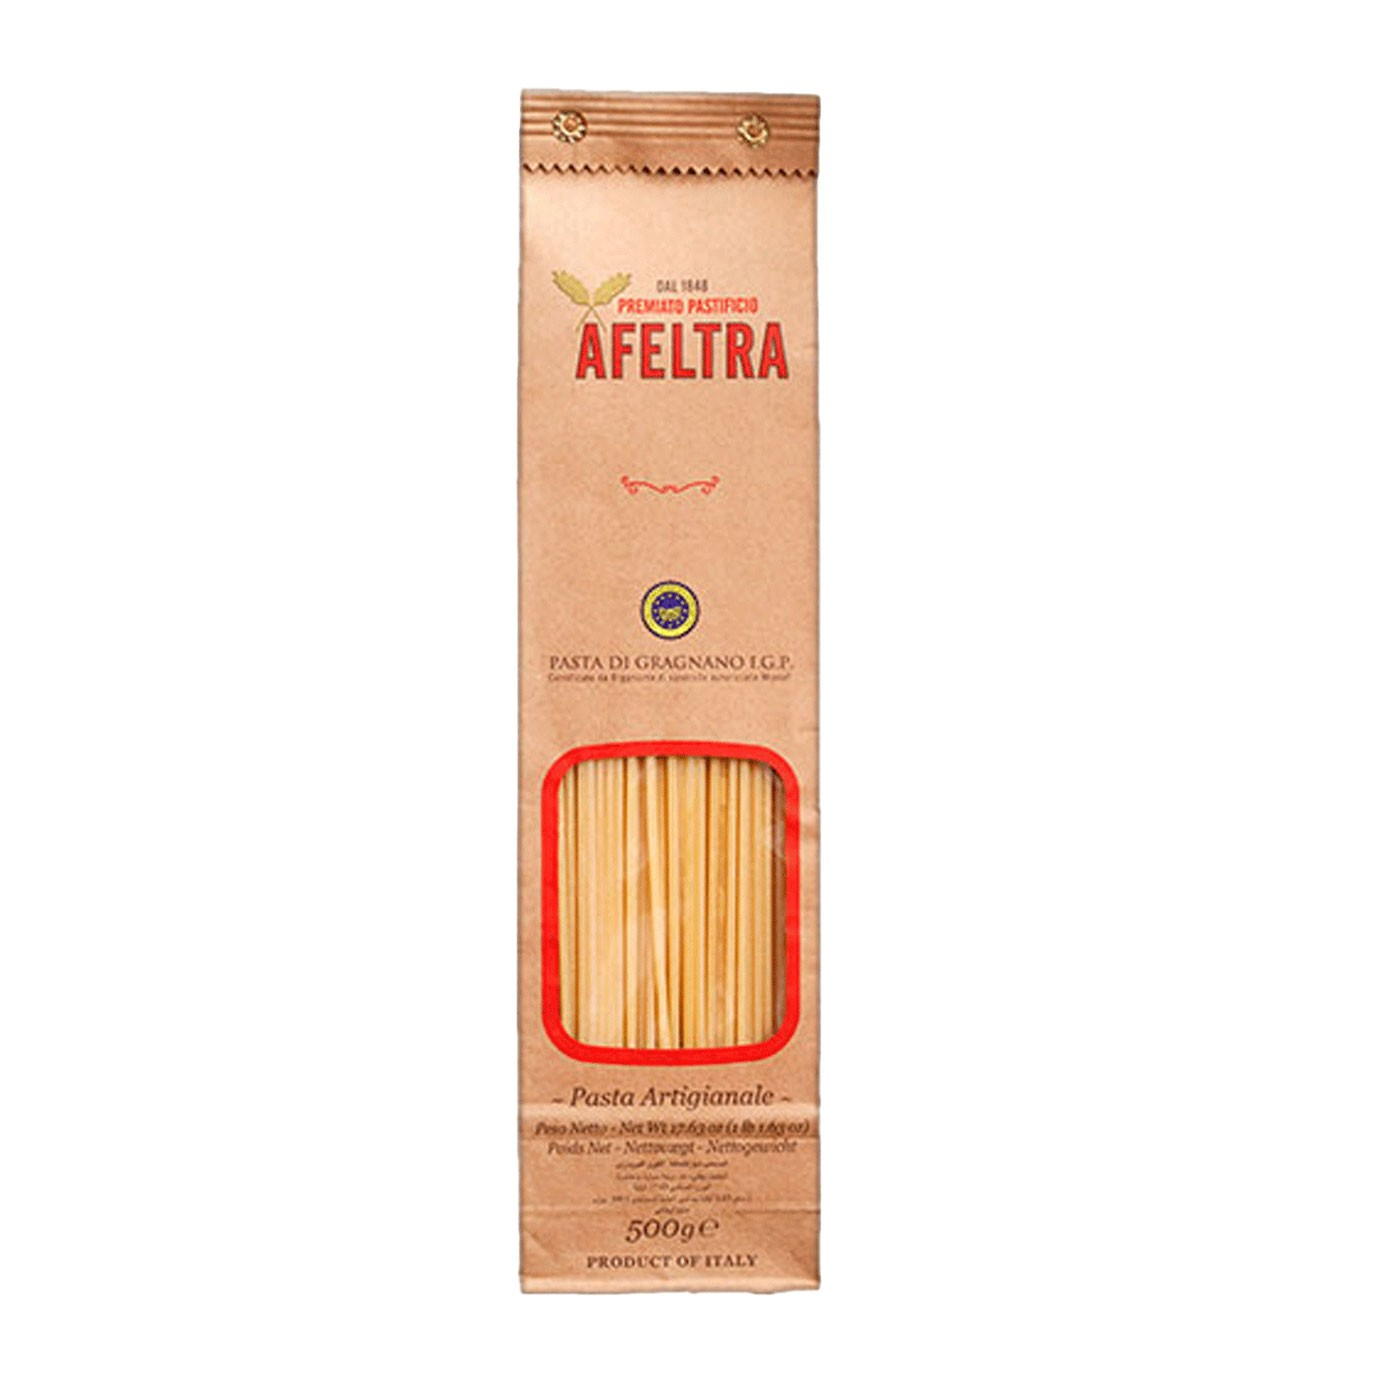 Spaghetti Chitarra 17.6 oz - Afeltra